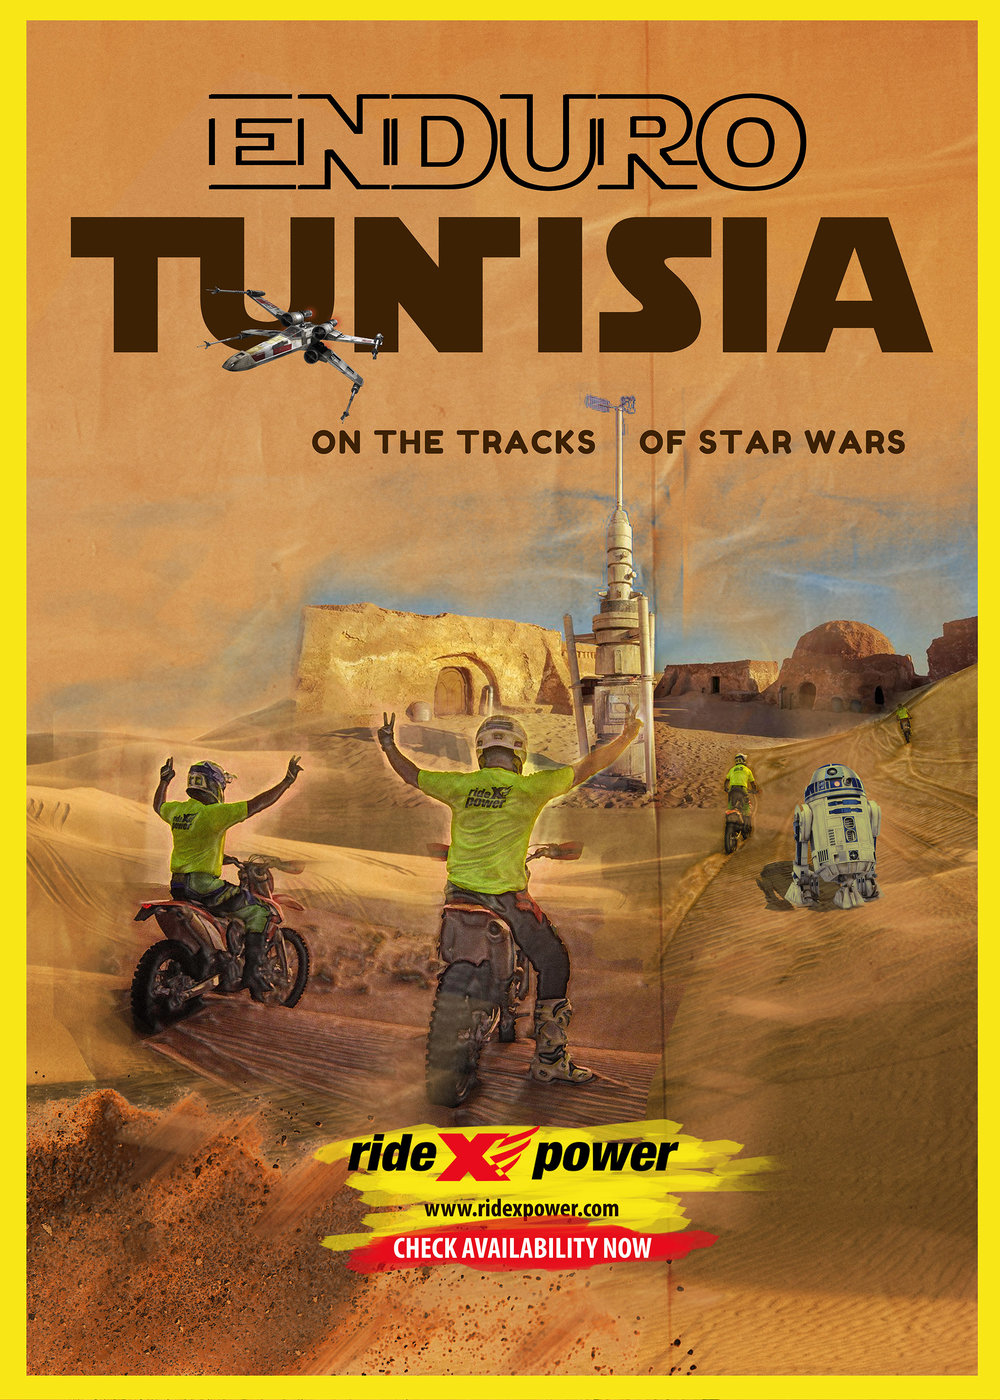 tunisia poster.jpg